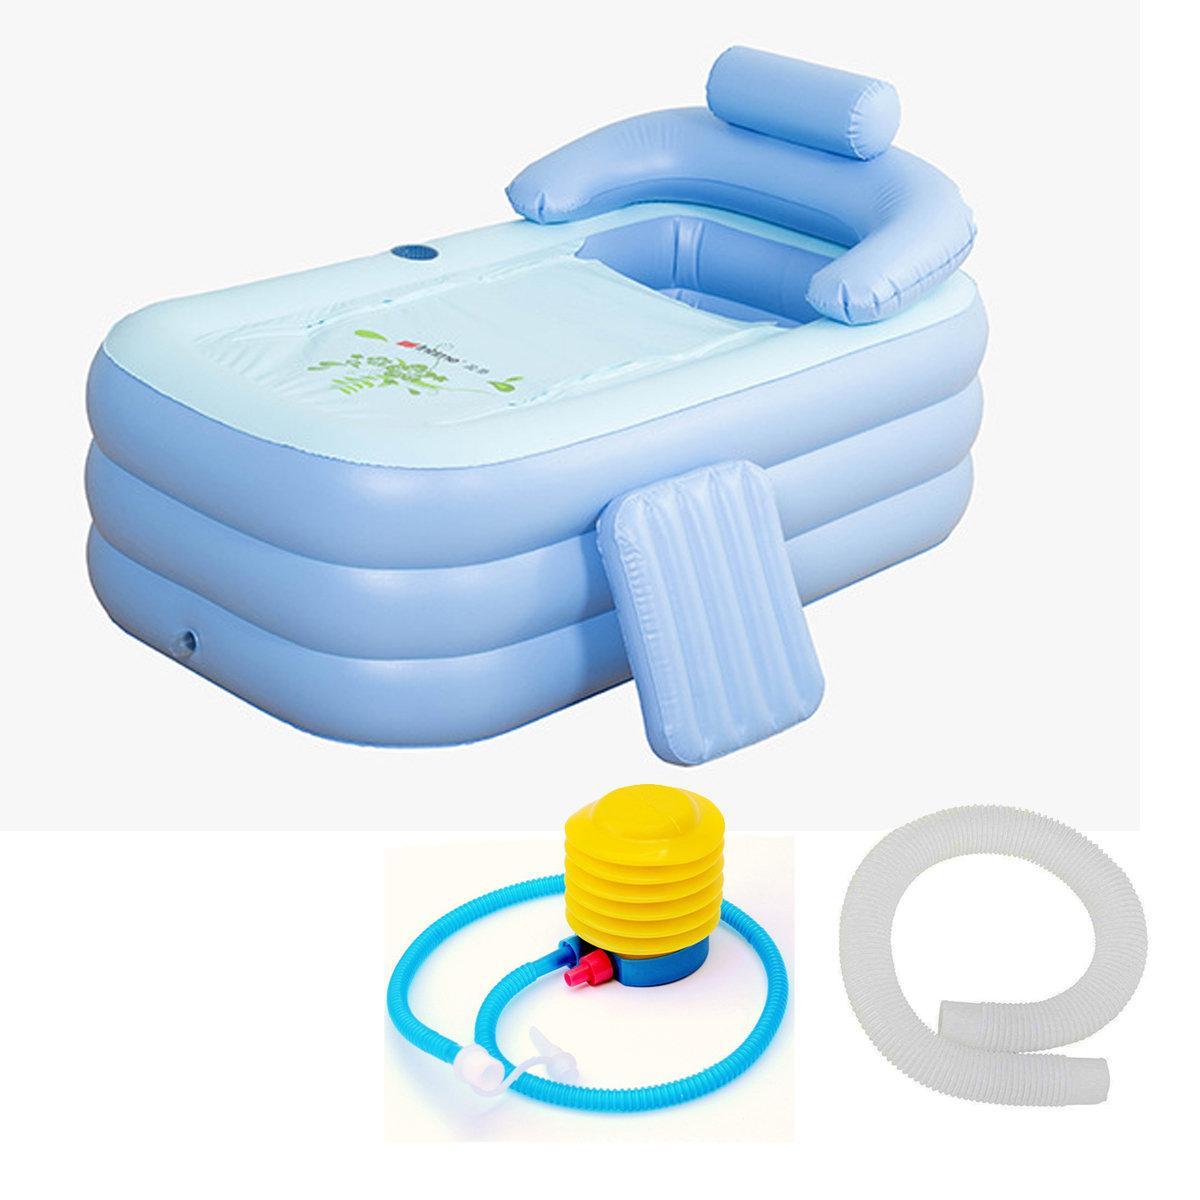 160 *84* 64cm Foldable Inflatable Bath Tub PVC Adult Bathtub With Air Pump